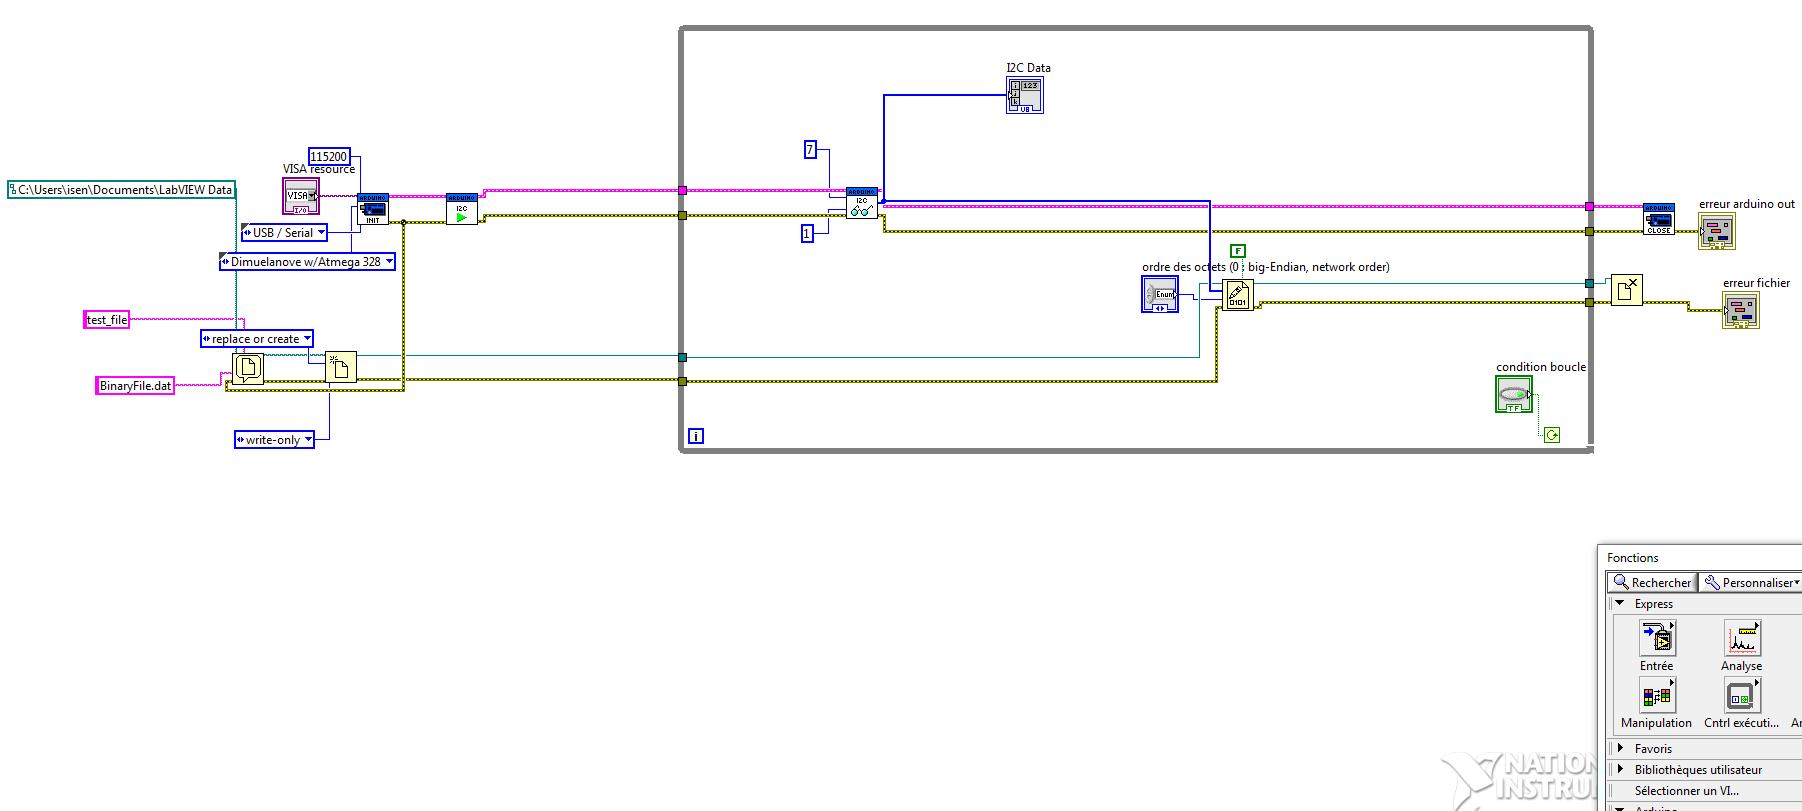 Labview-Arduino I2C error 5003 - NI Community - National